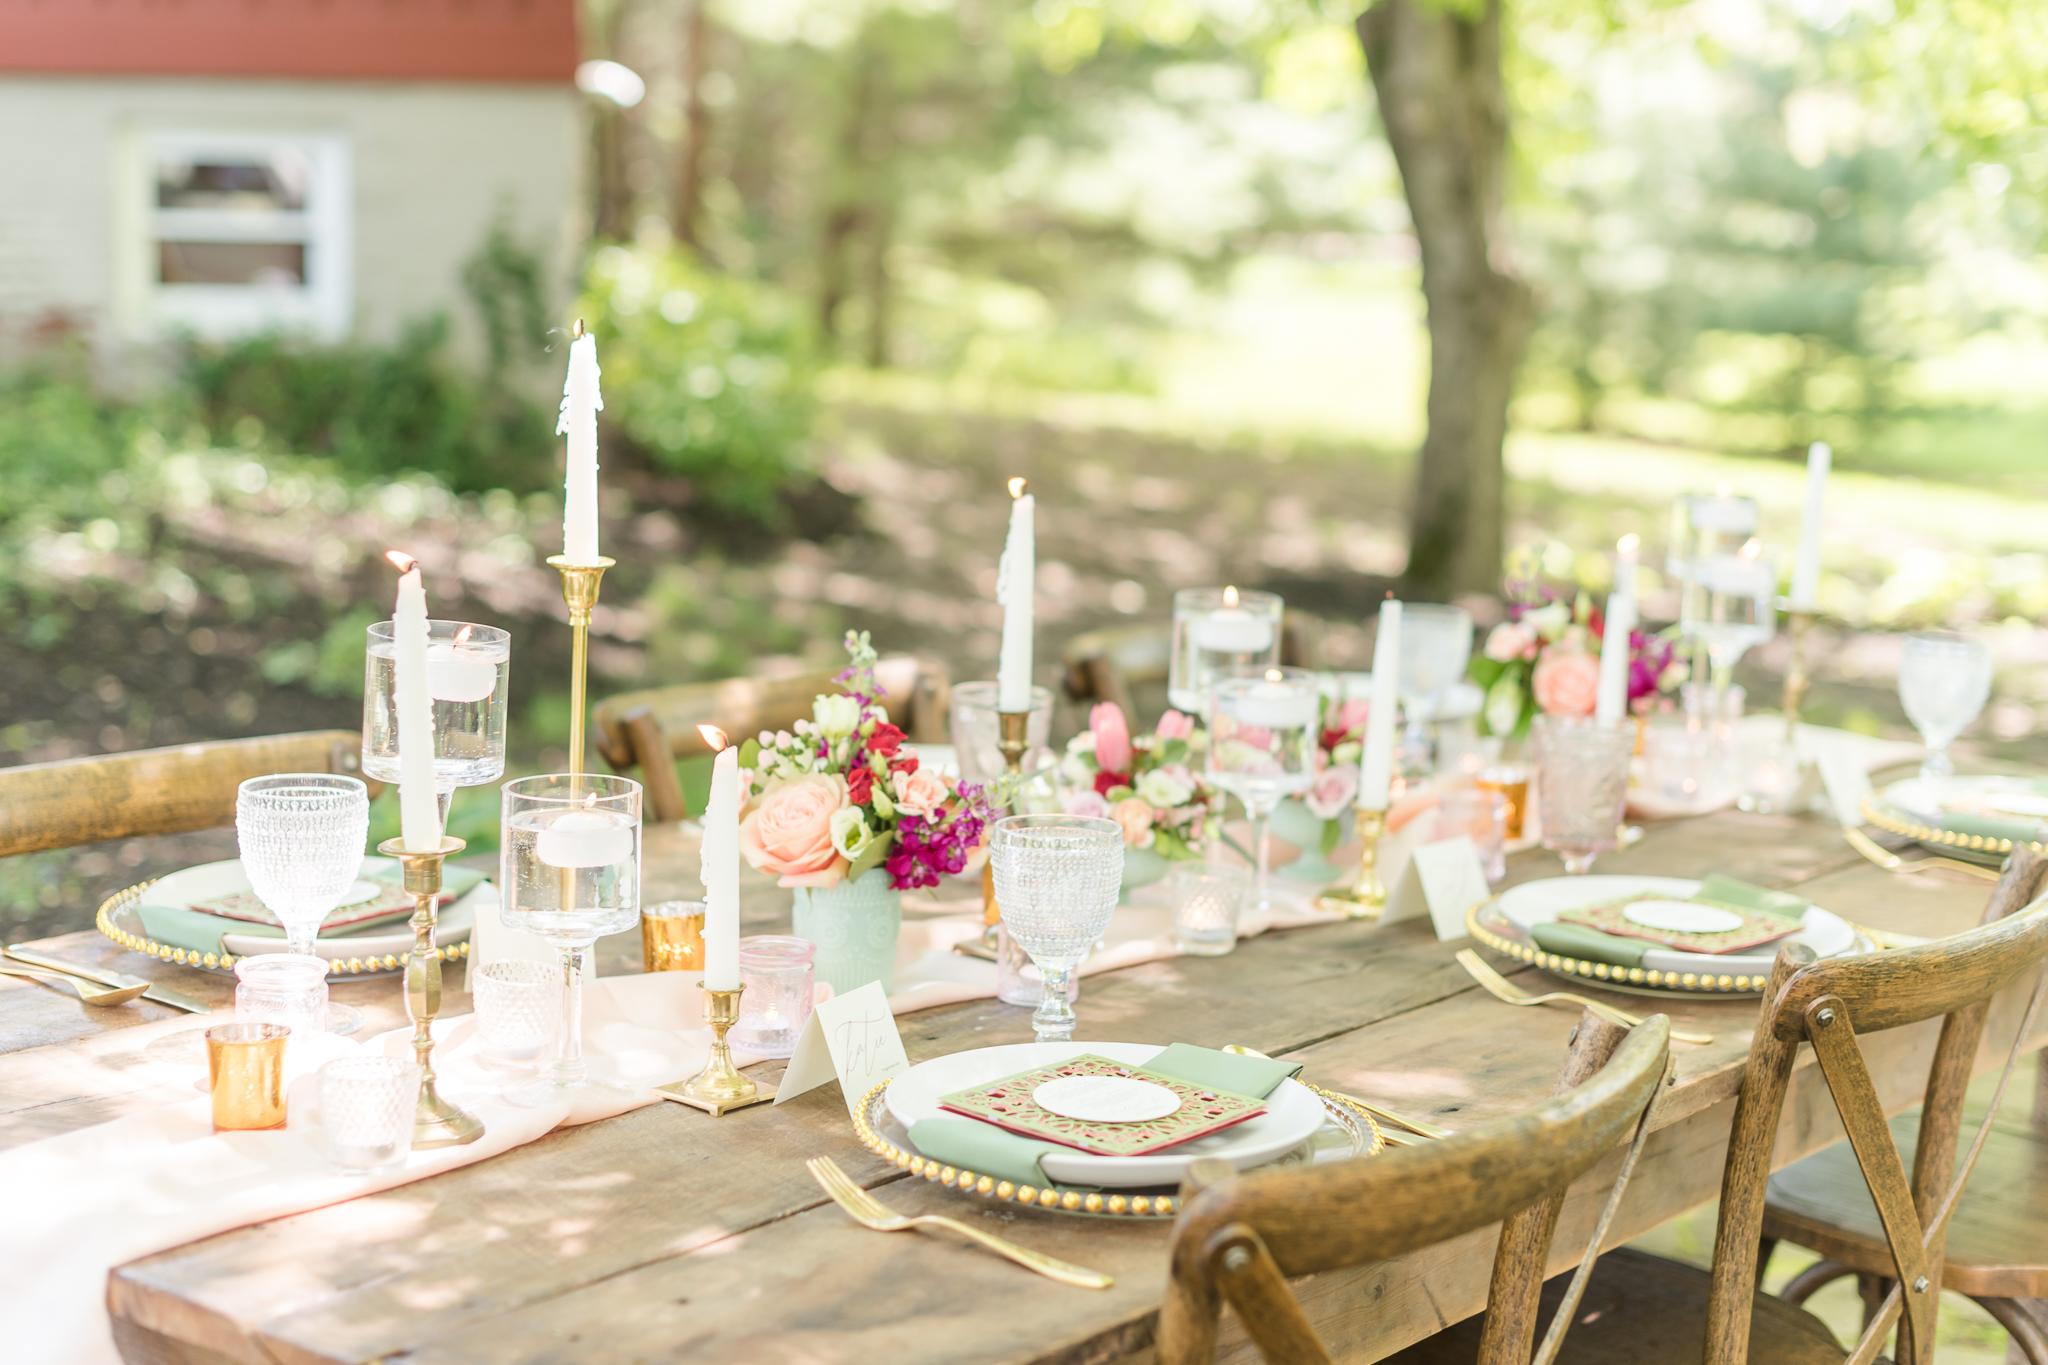 Mustard Seed Gardens Wedding Indianapolis Noblesvile Fishers Wedding Photographer-76.jpg